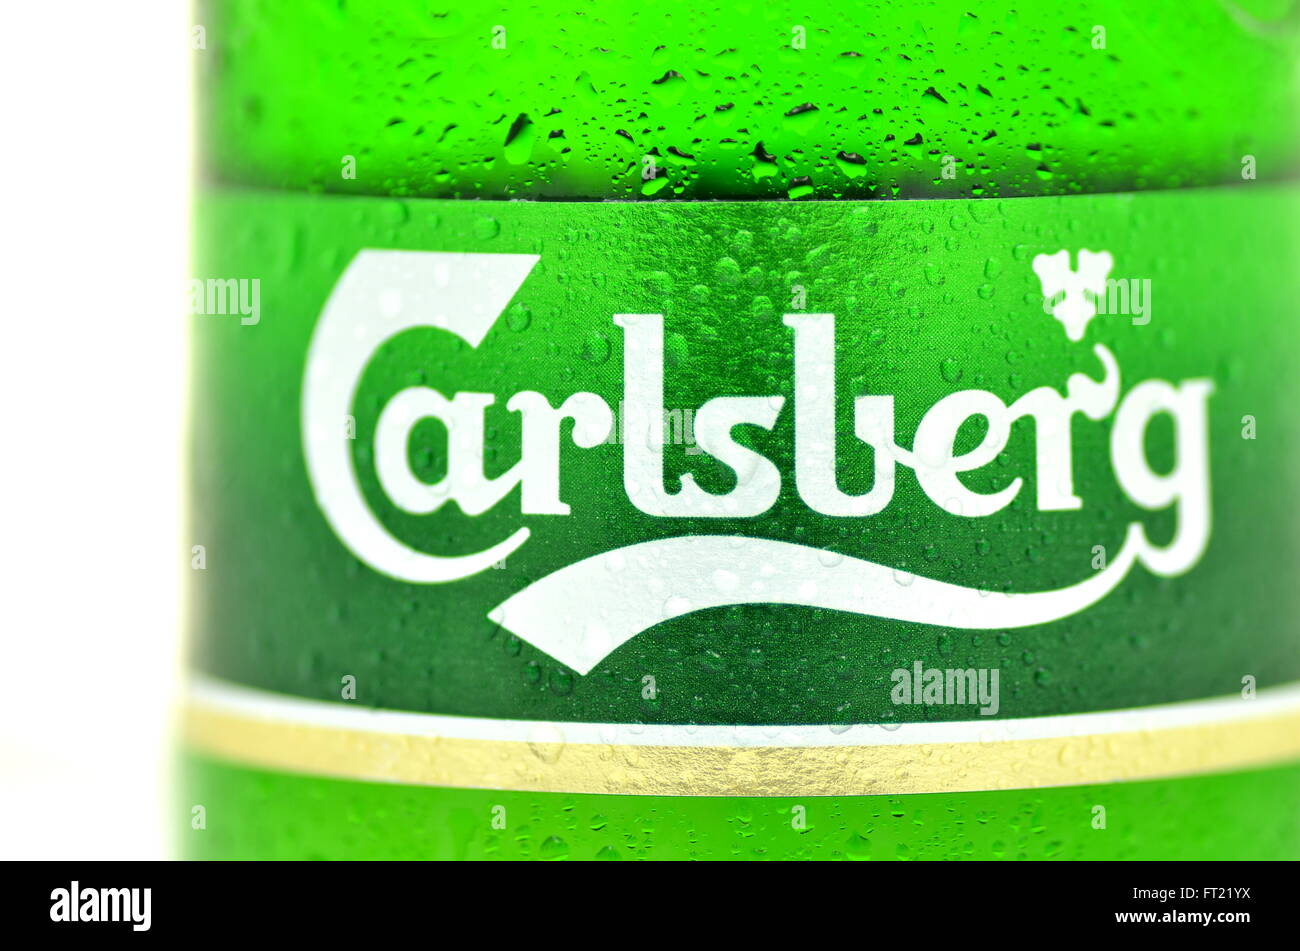 Carlsberg beer isolated on white background - Stock Image